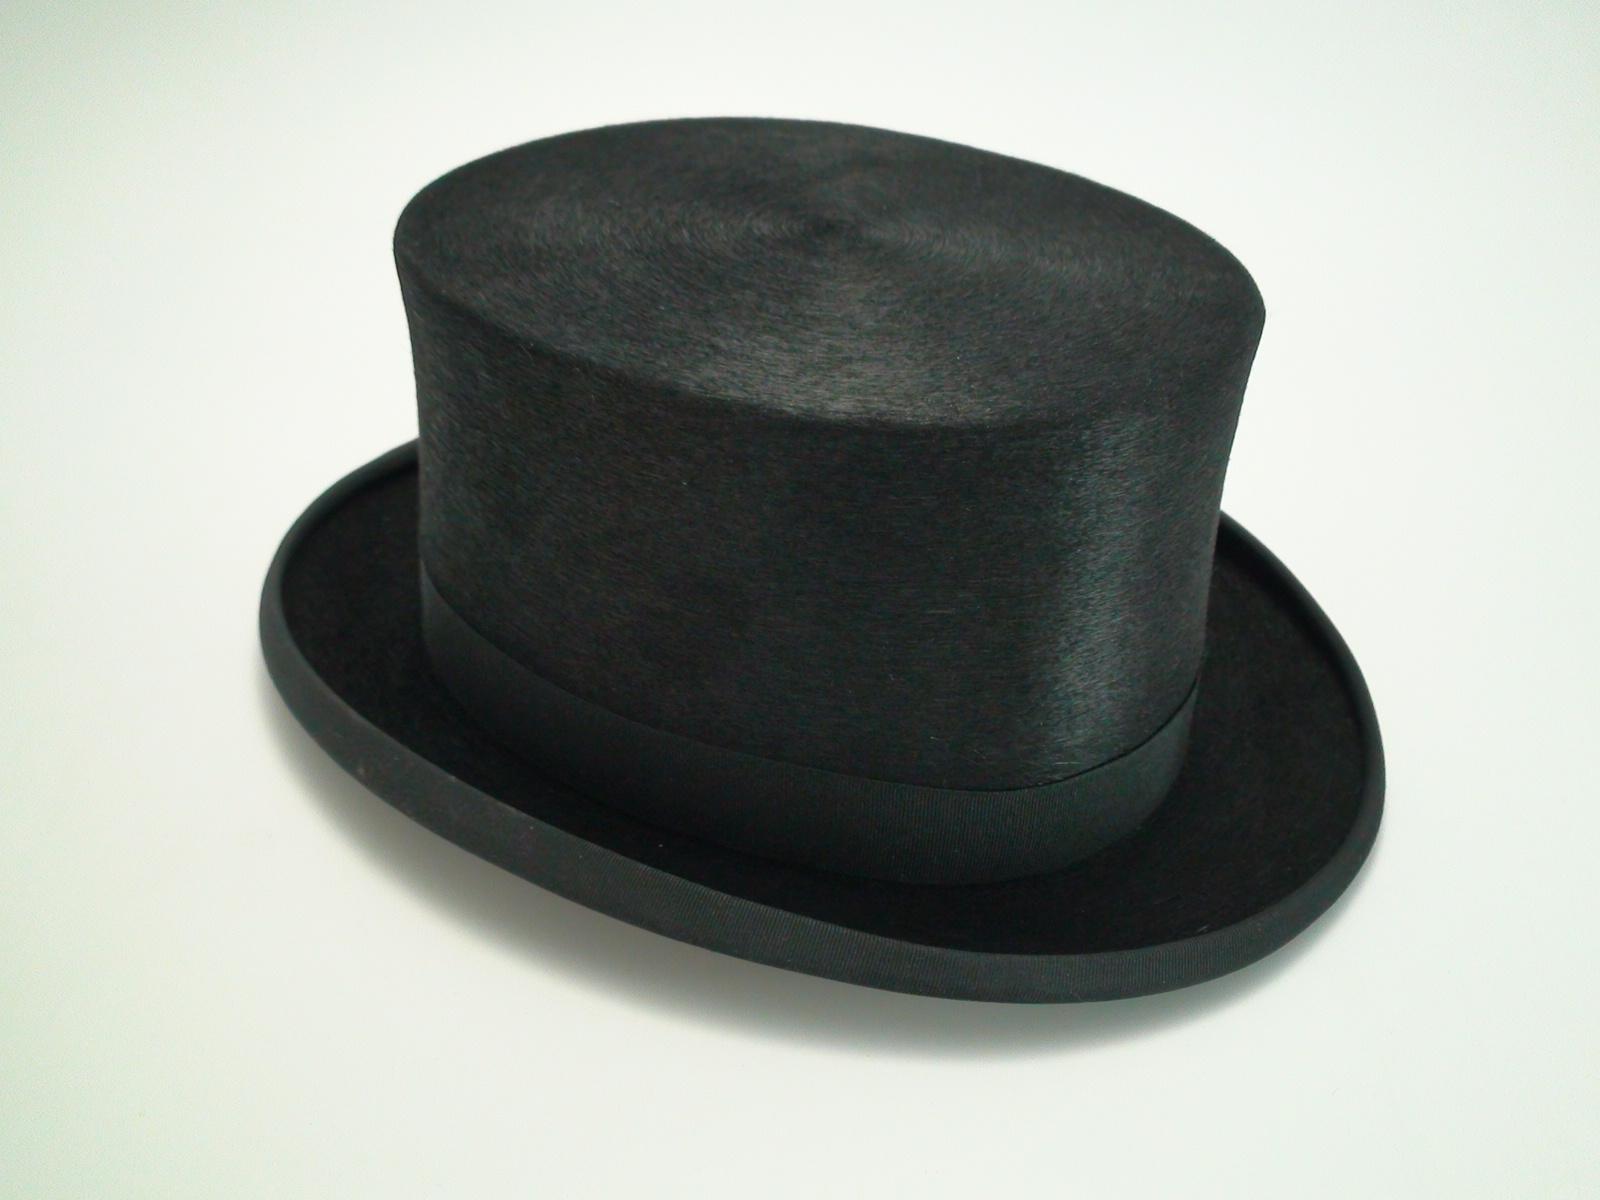 7ee72a3310a45f Christys London 100% Fine Fur Felt Black Dressage Top Hat